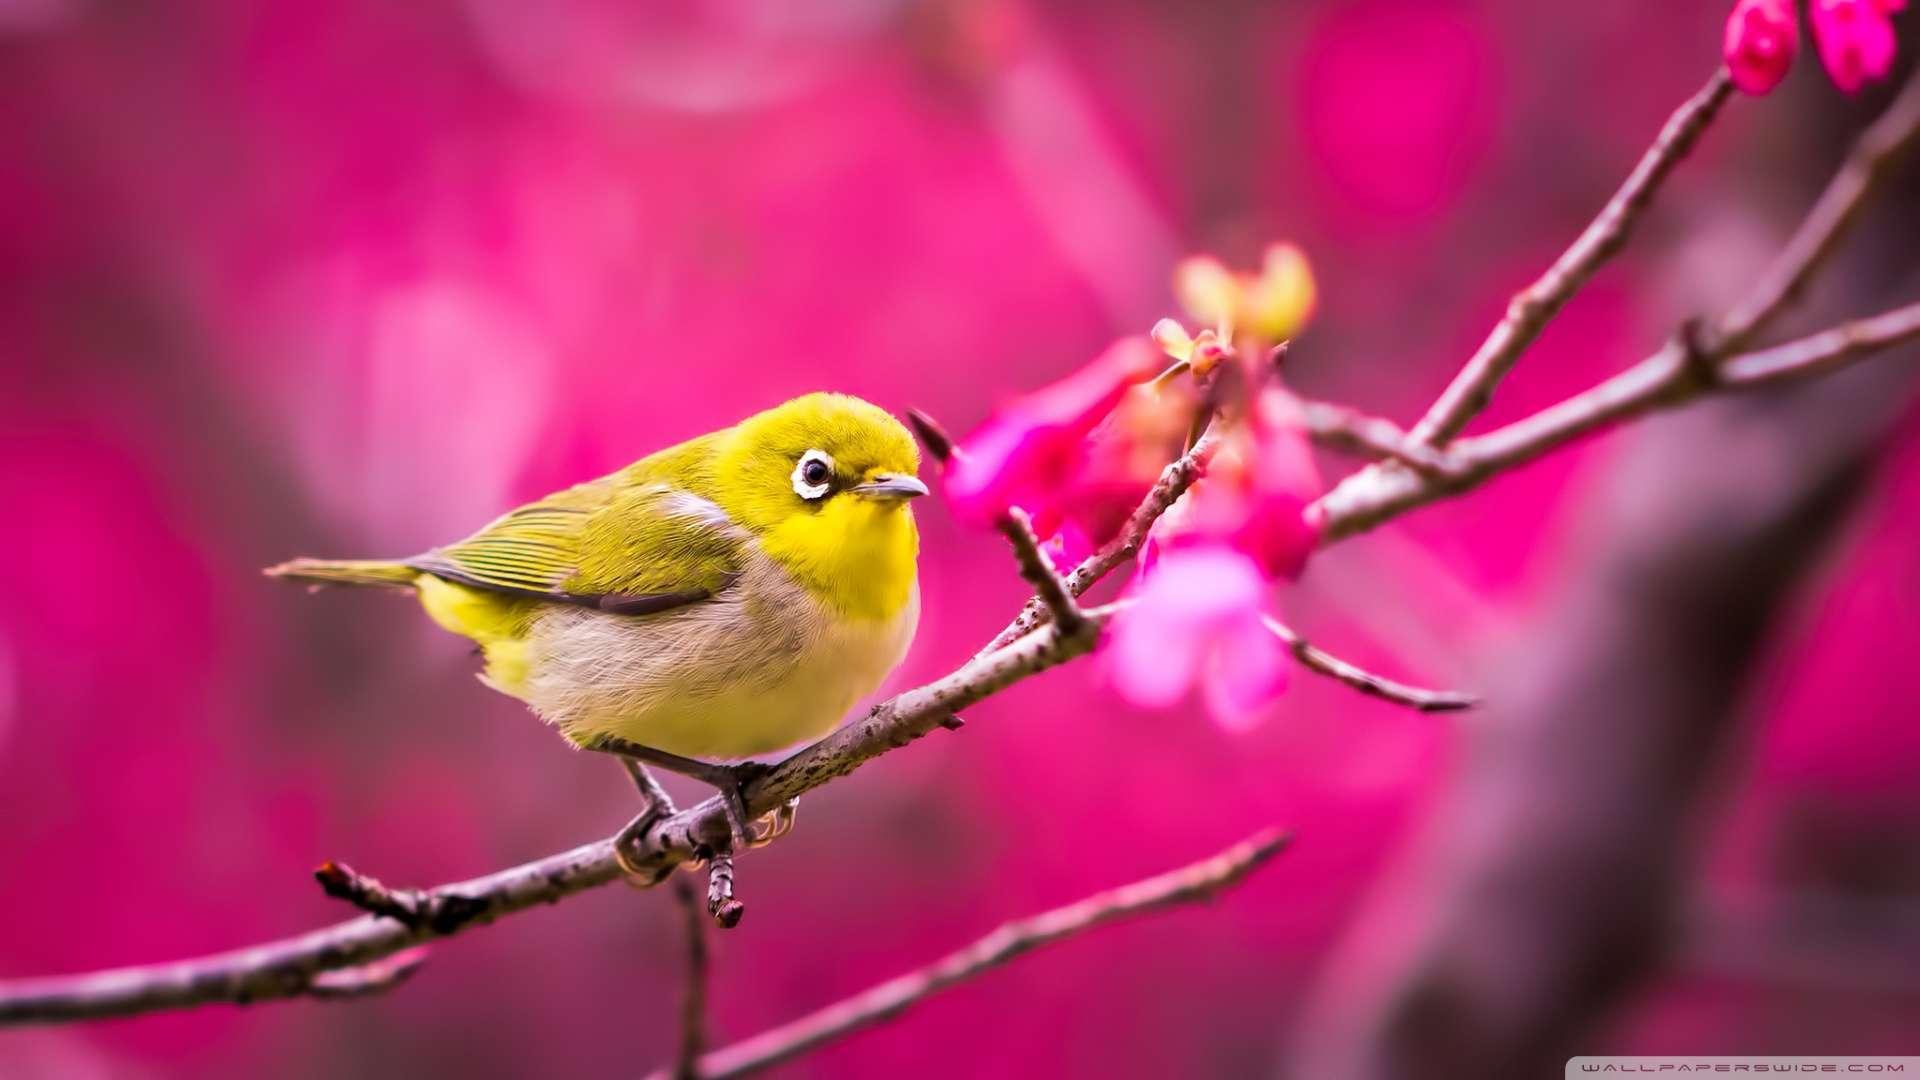 Wallpaper Yellow Bird Springtime Wallpaper 1080p HD Upload at 1920x1080